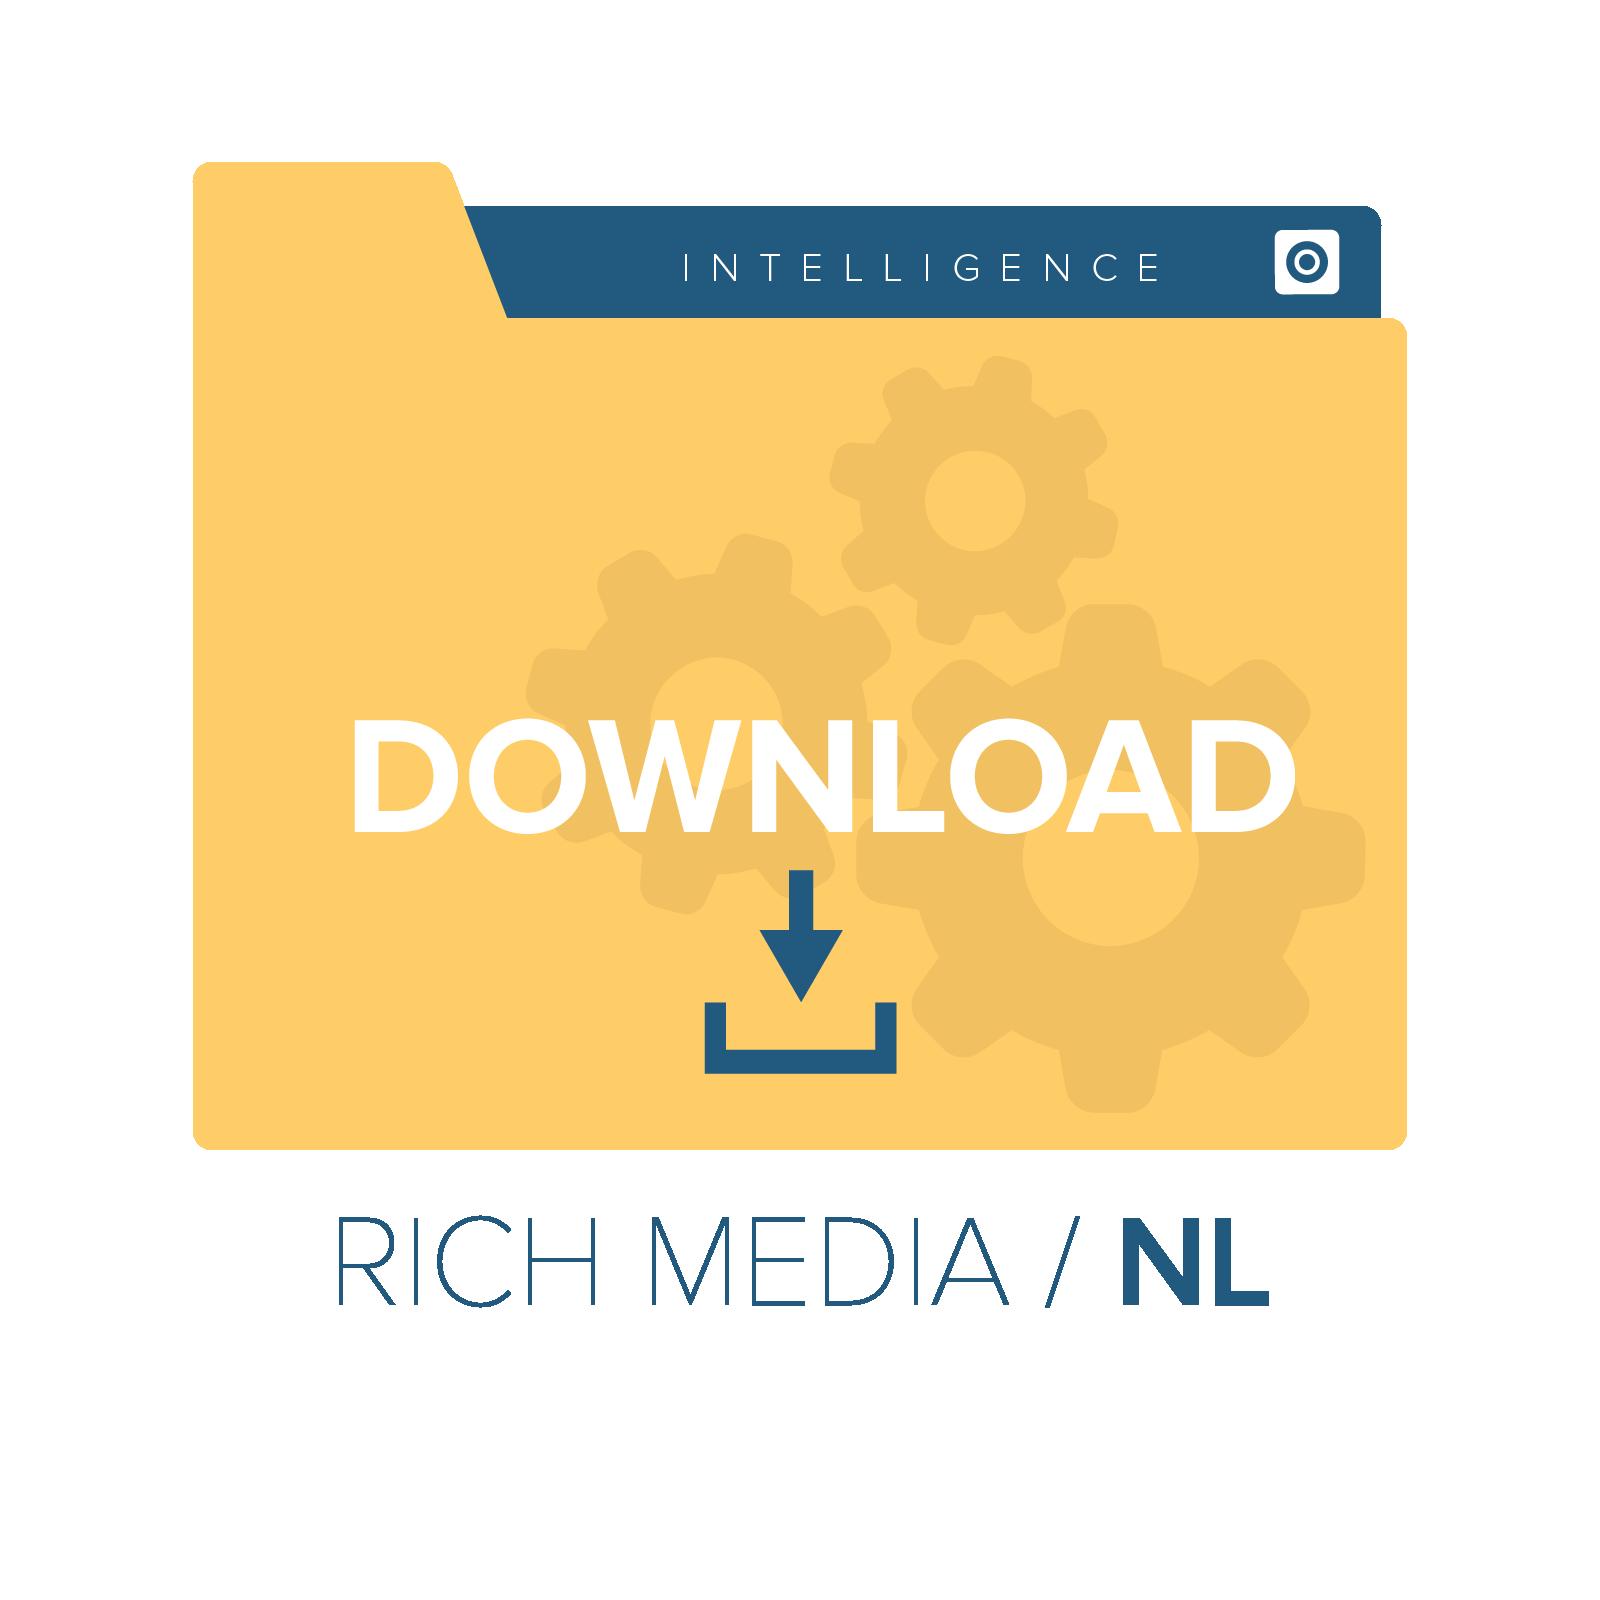 rich-media-nl.png